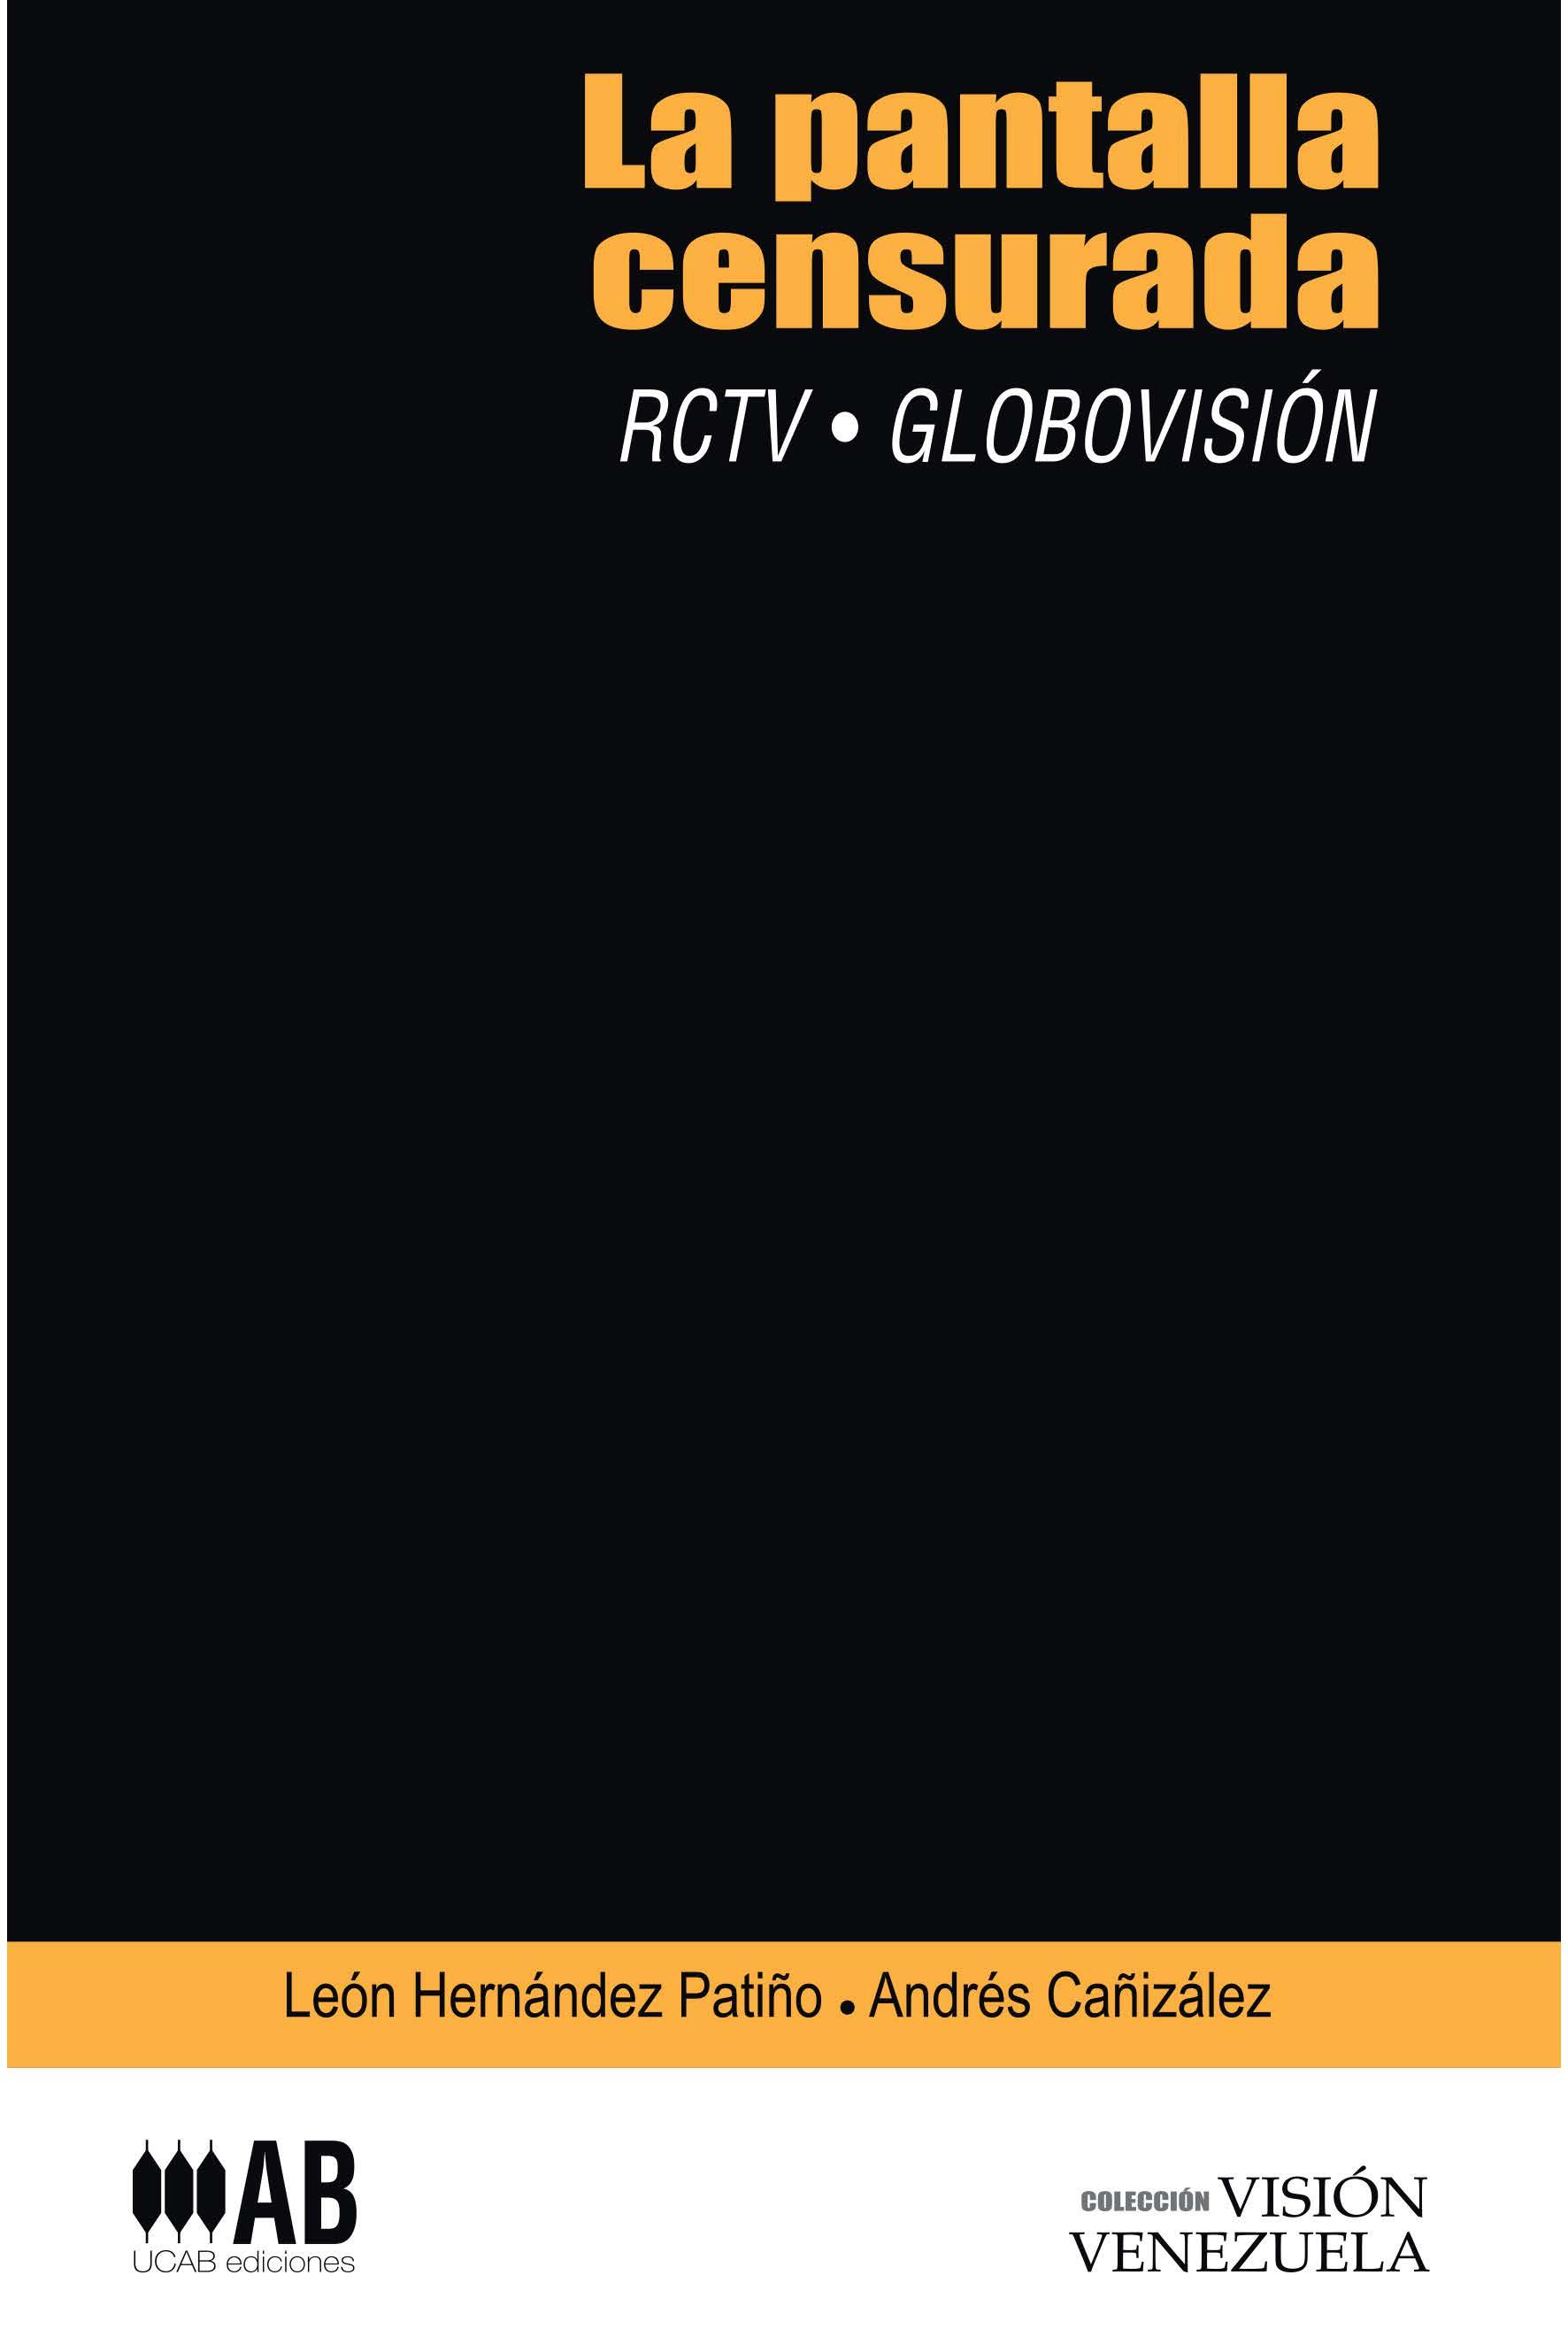 La pantalla censurada RCTV-Globovisión